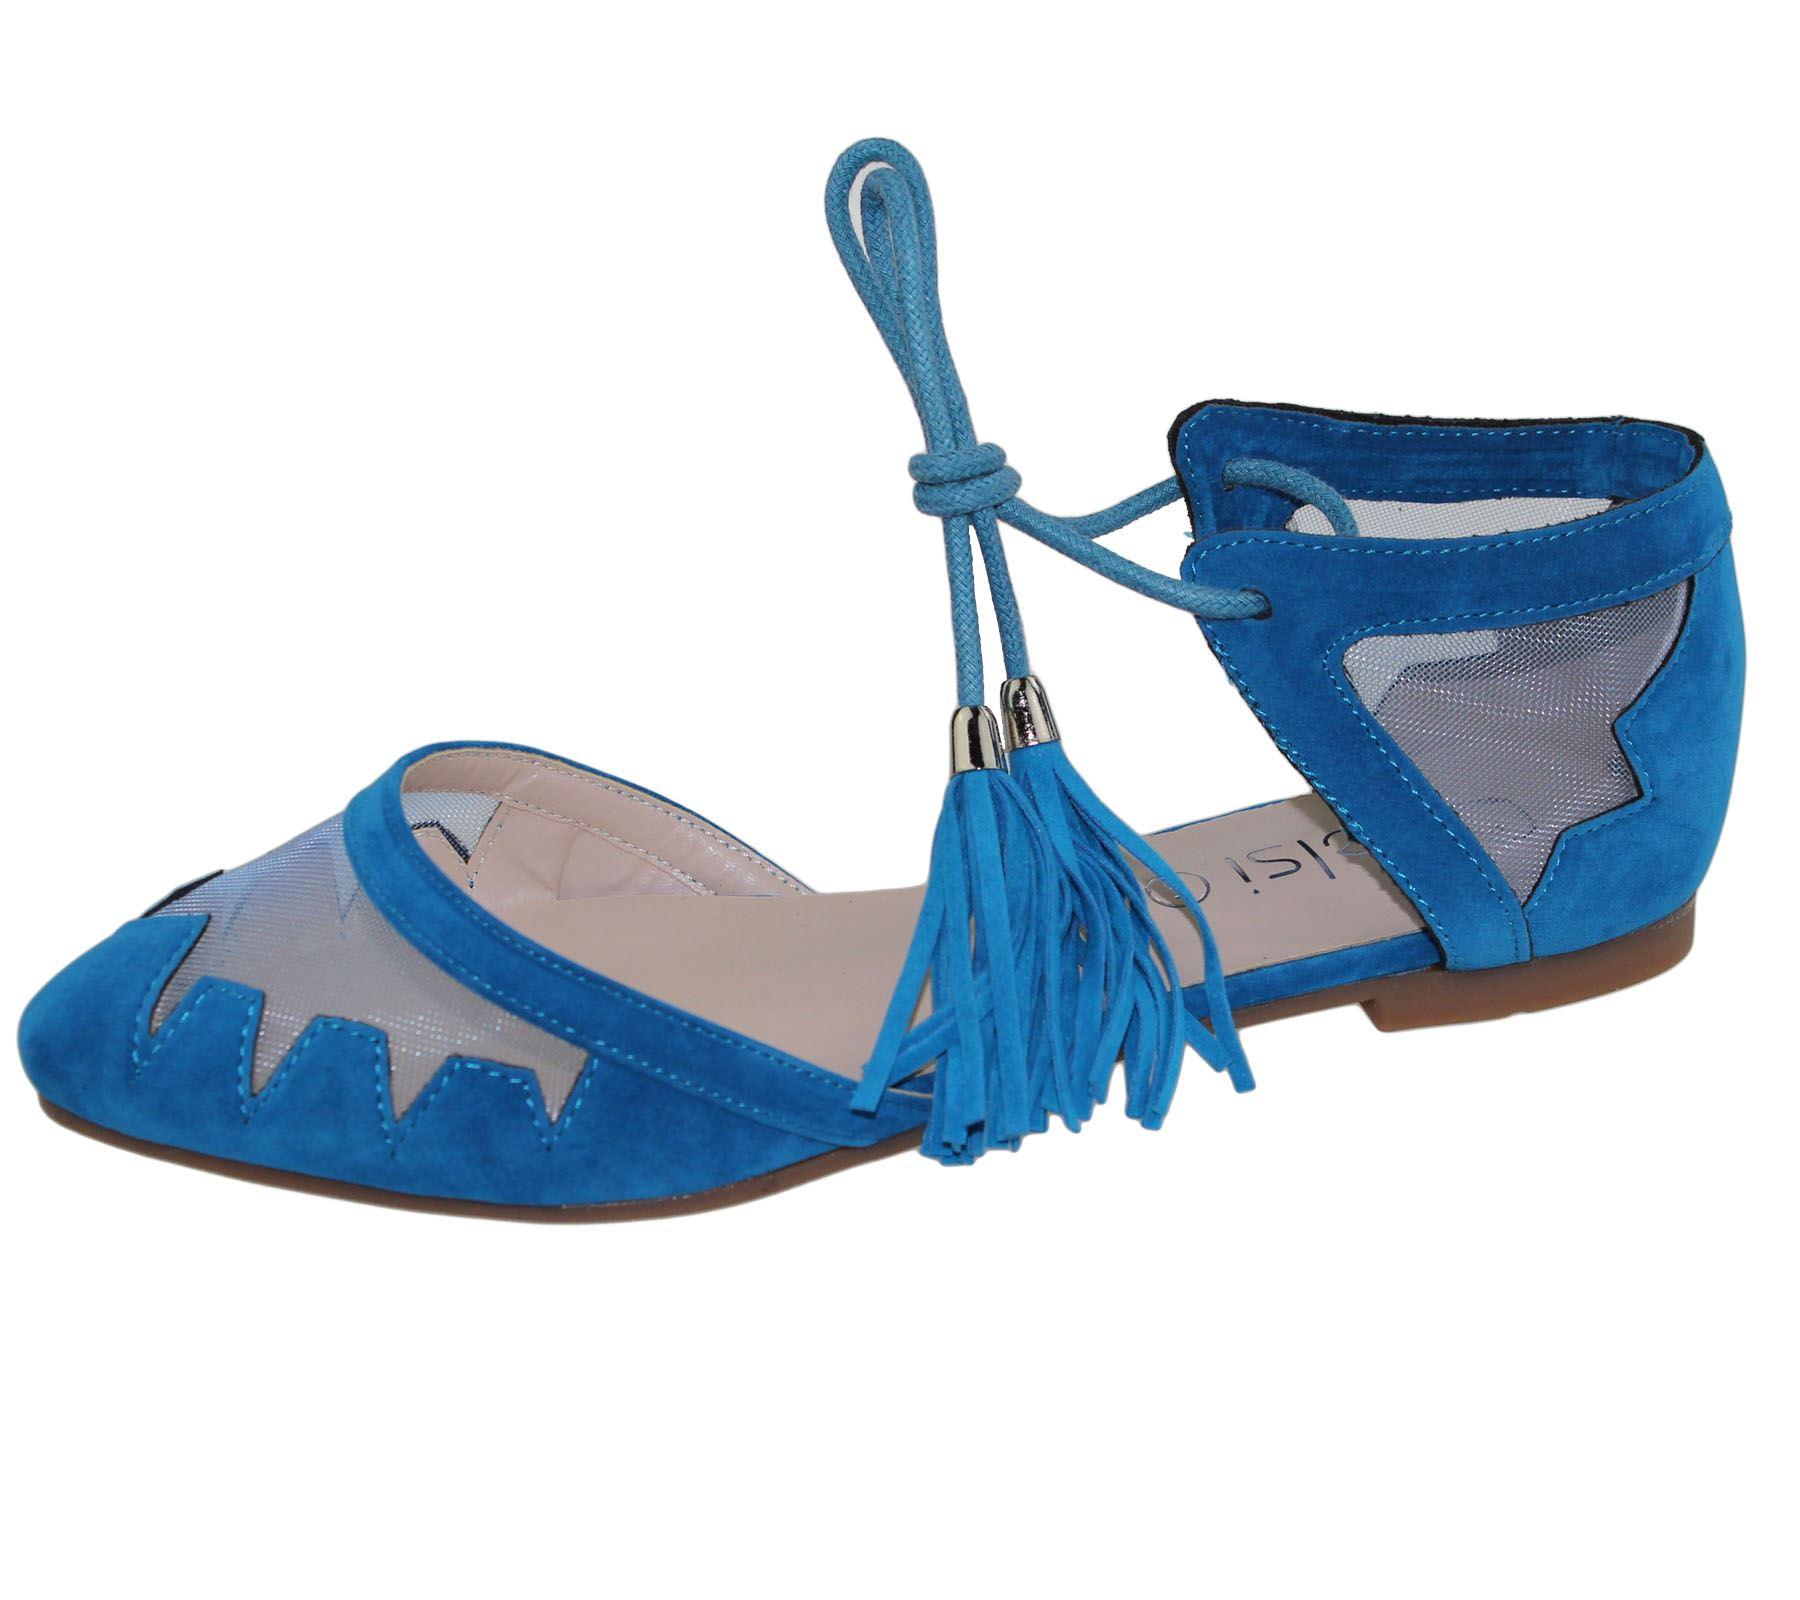 Womens-Flat-Ballerina-Dolly-Pumps-Ballet-Ladies-Summer-Mesh-Tassel-Shoes-Sandals thumbnail 7